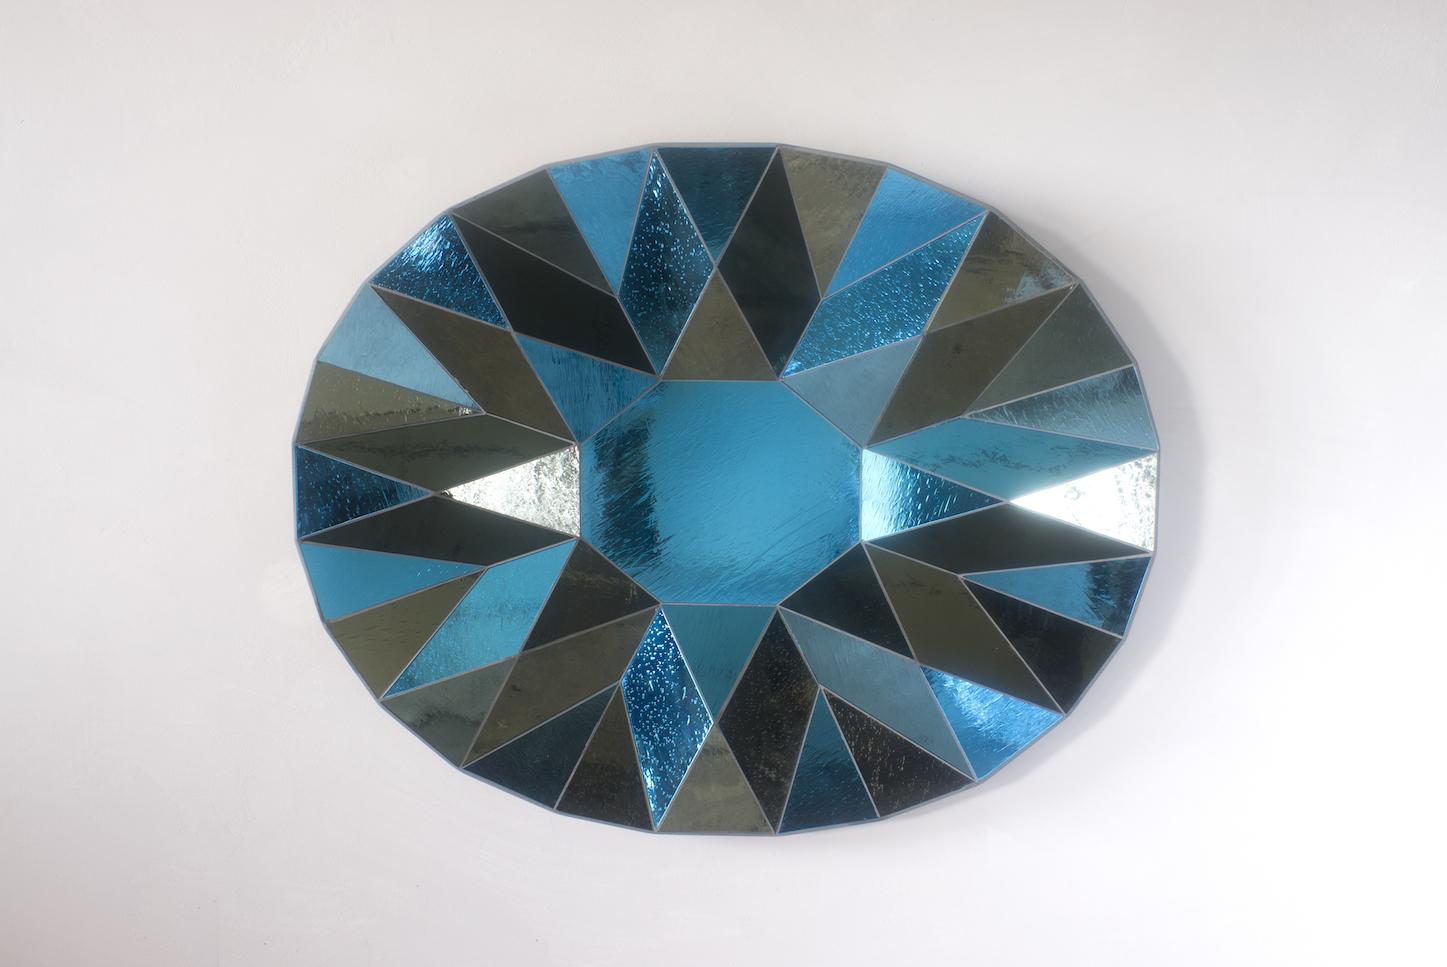 Sam Orlando Miller miroir Stella Nuova Fumi Gallery